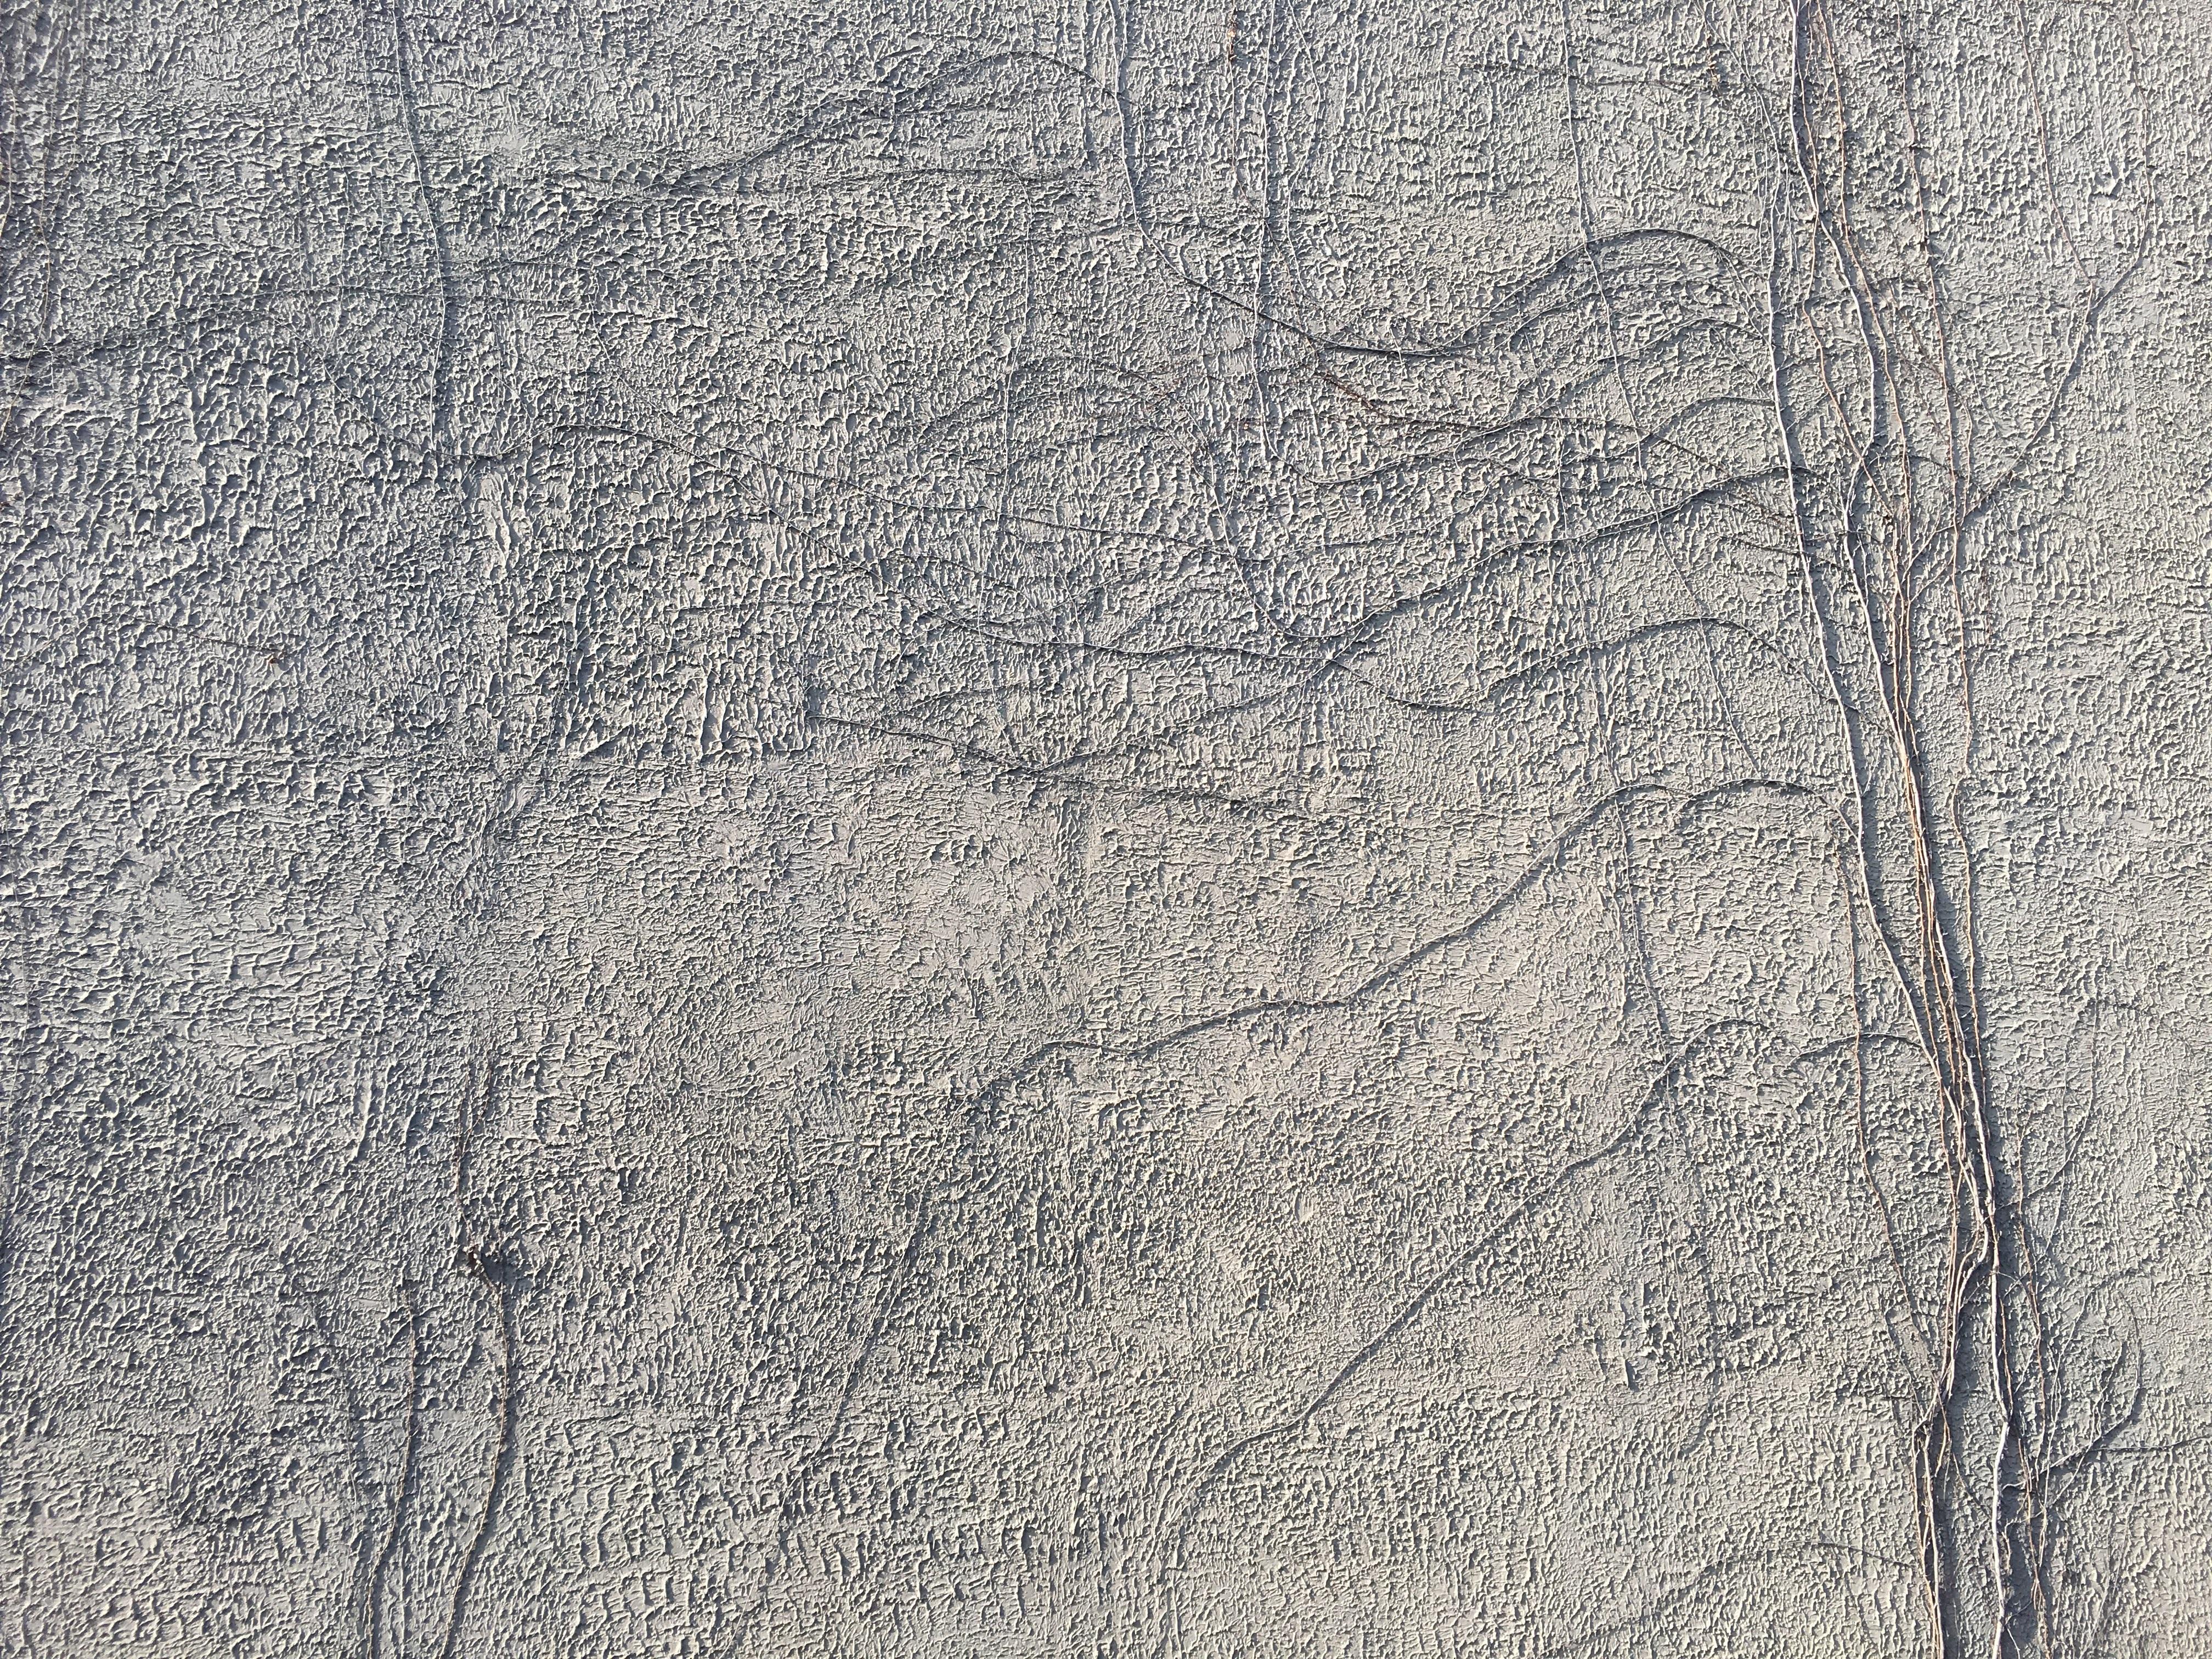 Free Images Vine White Texture Floor Wall Asphalt